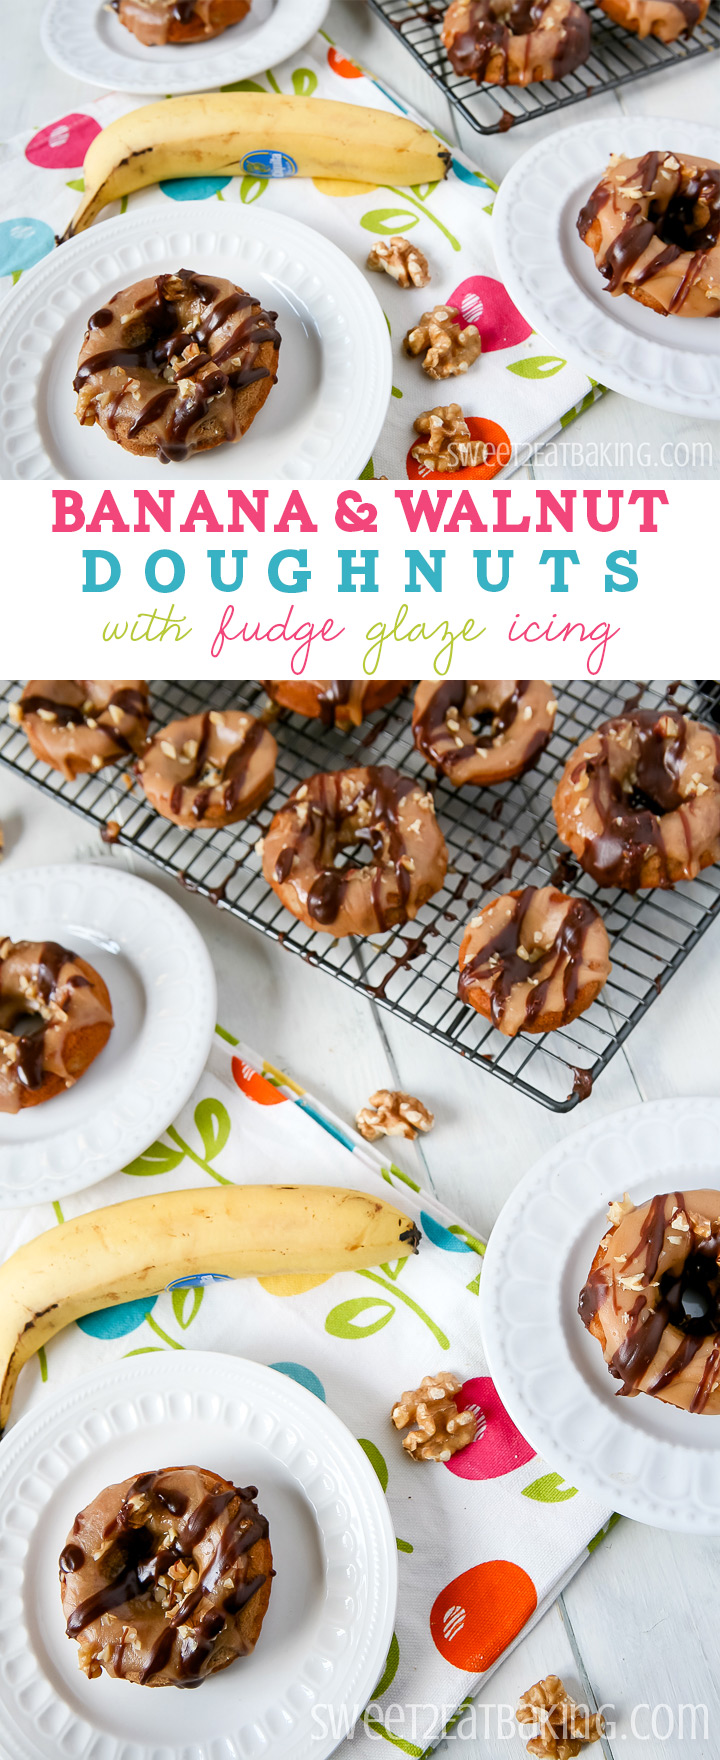 Banana & Walnut Baked Doughnuts with Fudge Glaze Icing Recipe by Sweet2EatBaking.com